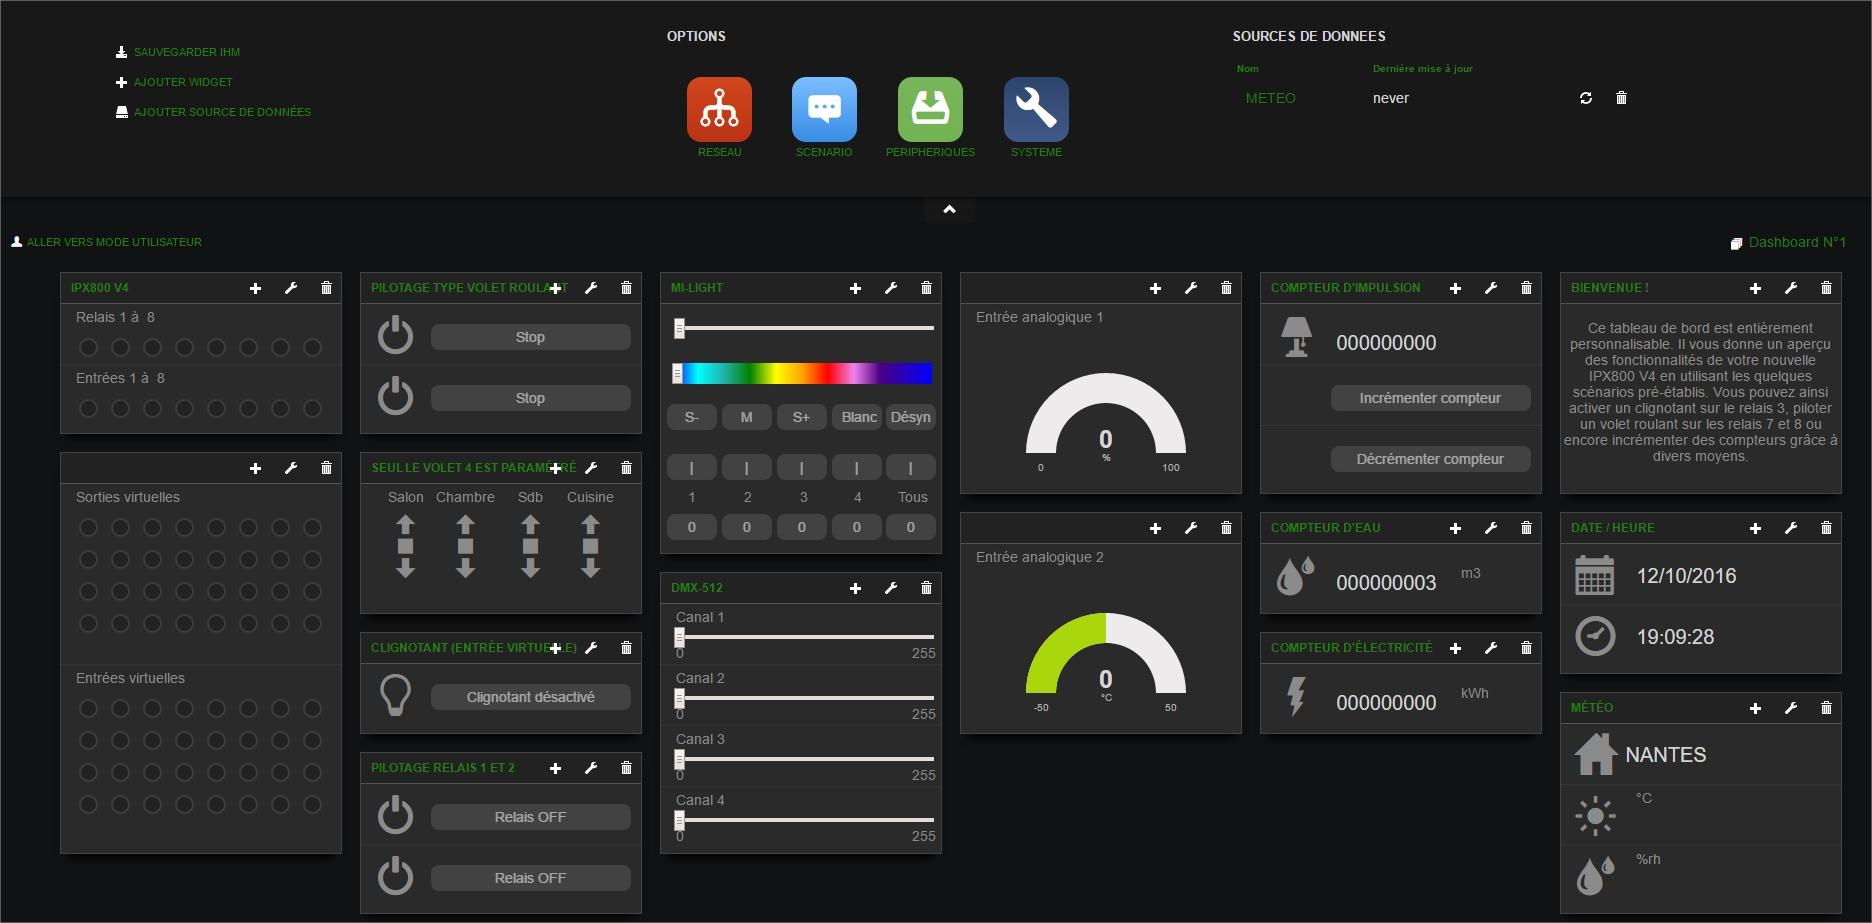 ihm-admin-ipx800-domotique-iot-smart-home-test